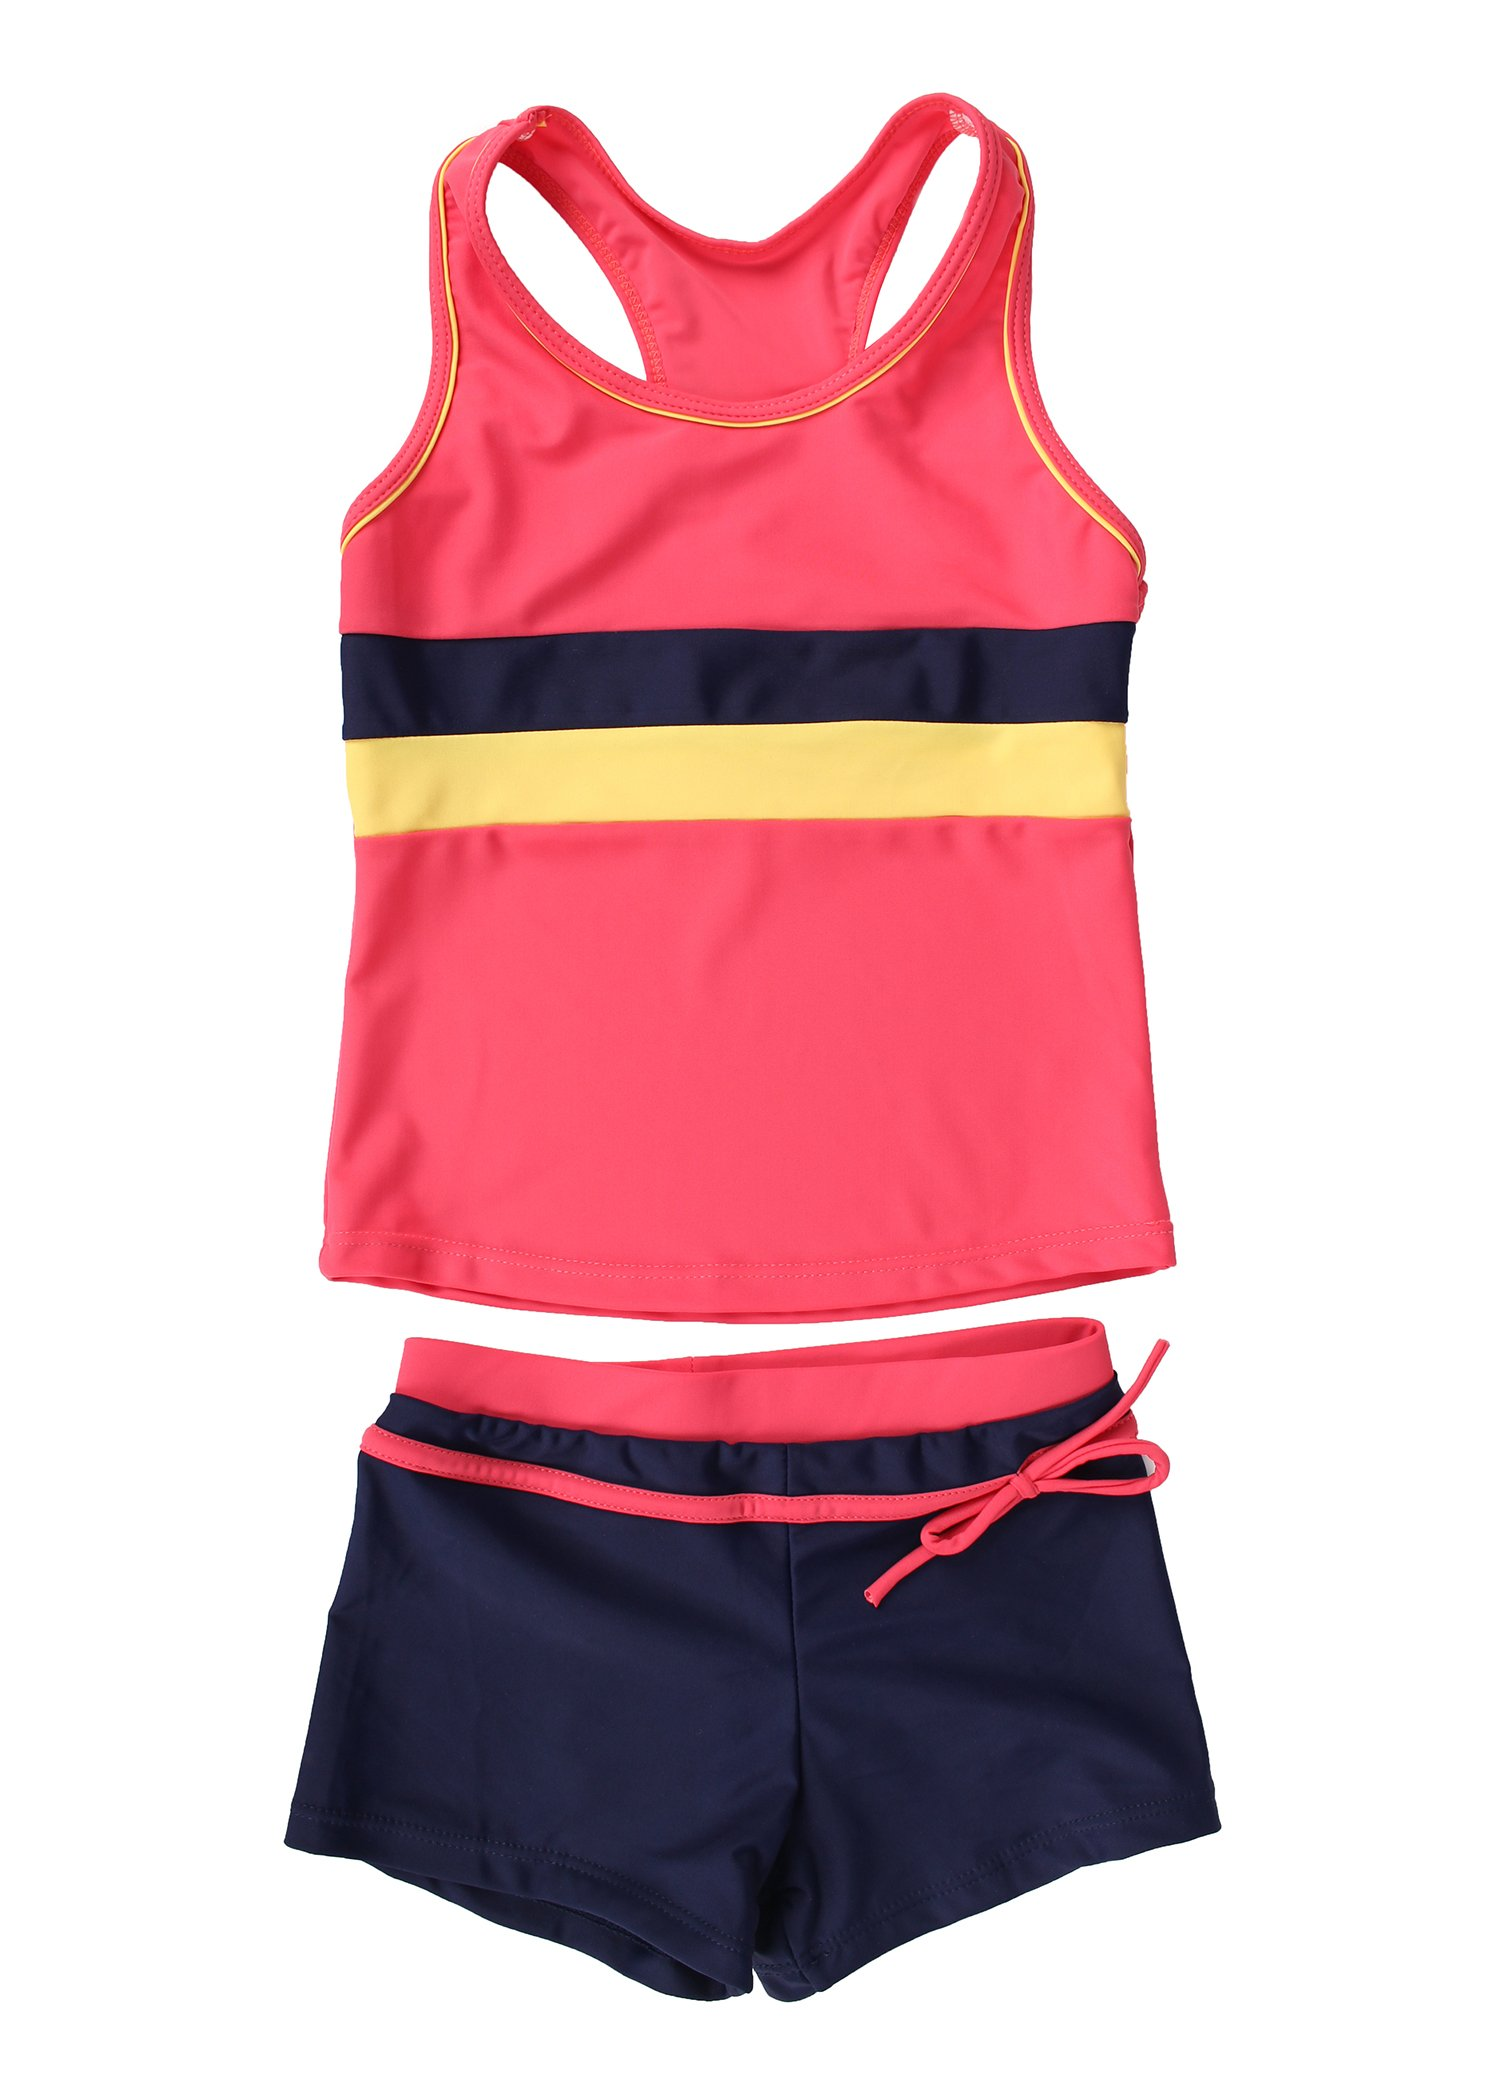 JerrisApparel Little Girls' Summer Two Piece Boyshort Tankini Kids Swimsuit (12-13/Tag Size 4XL, Watermelon Red)